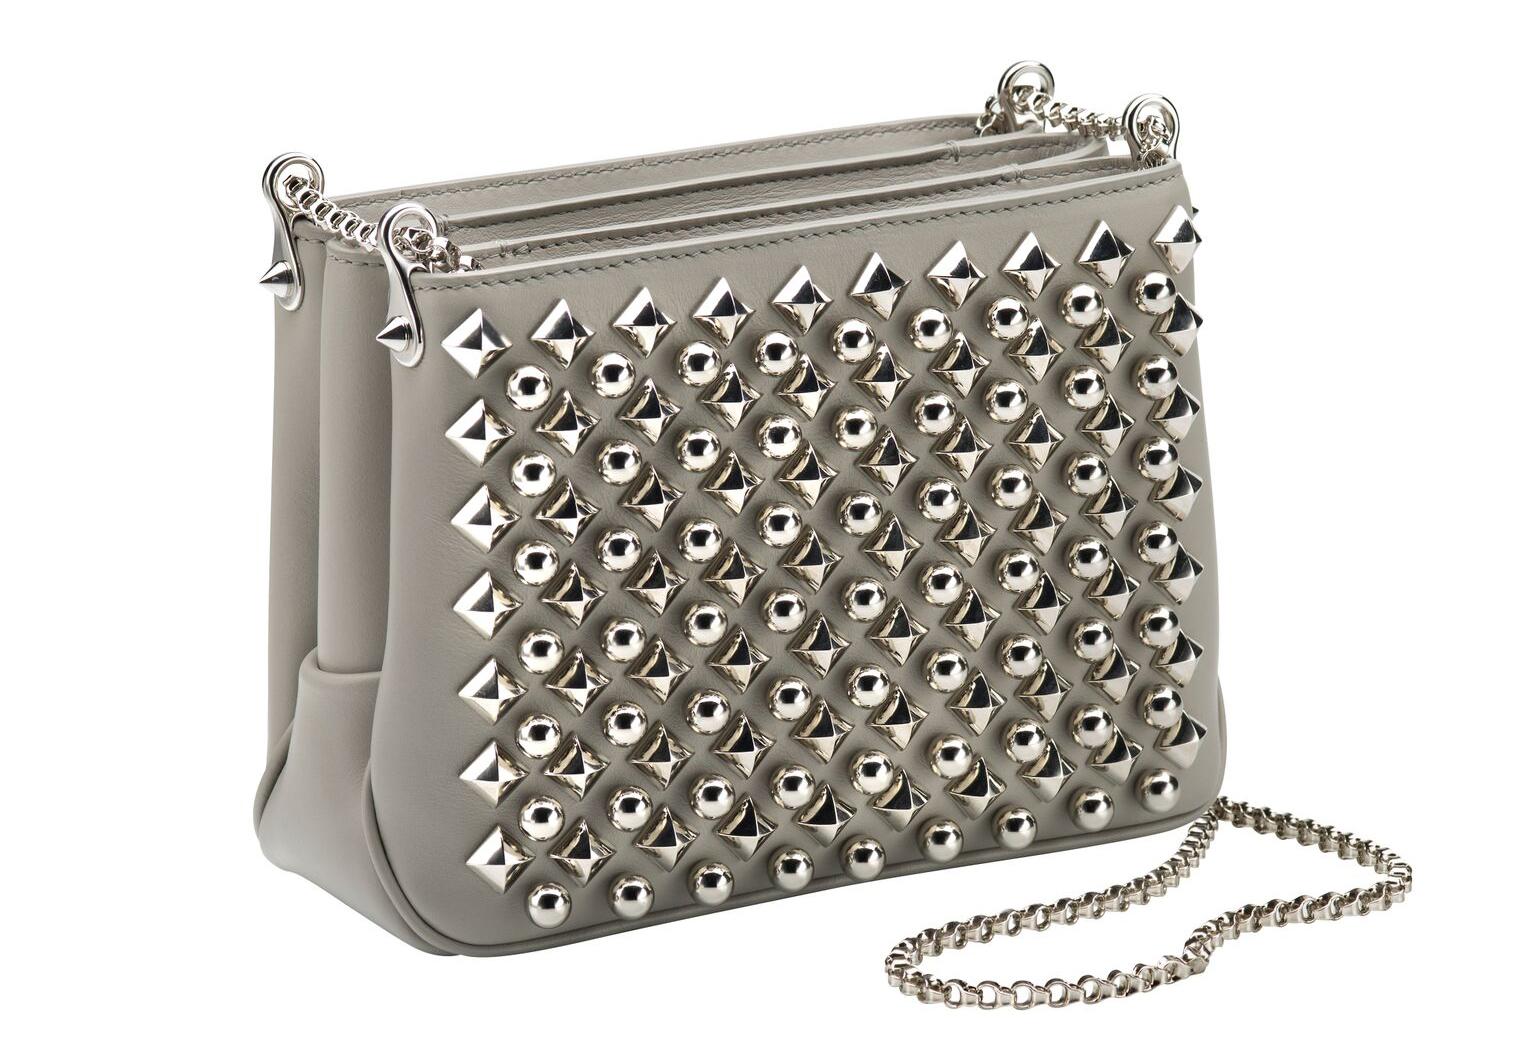 Christian Louboutin Small Triloubi Chain Bag